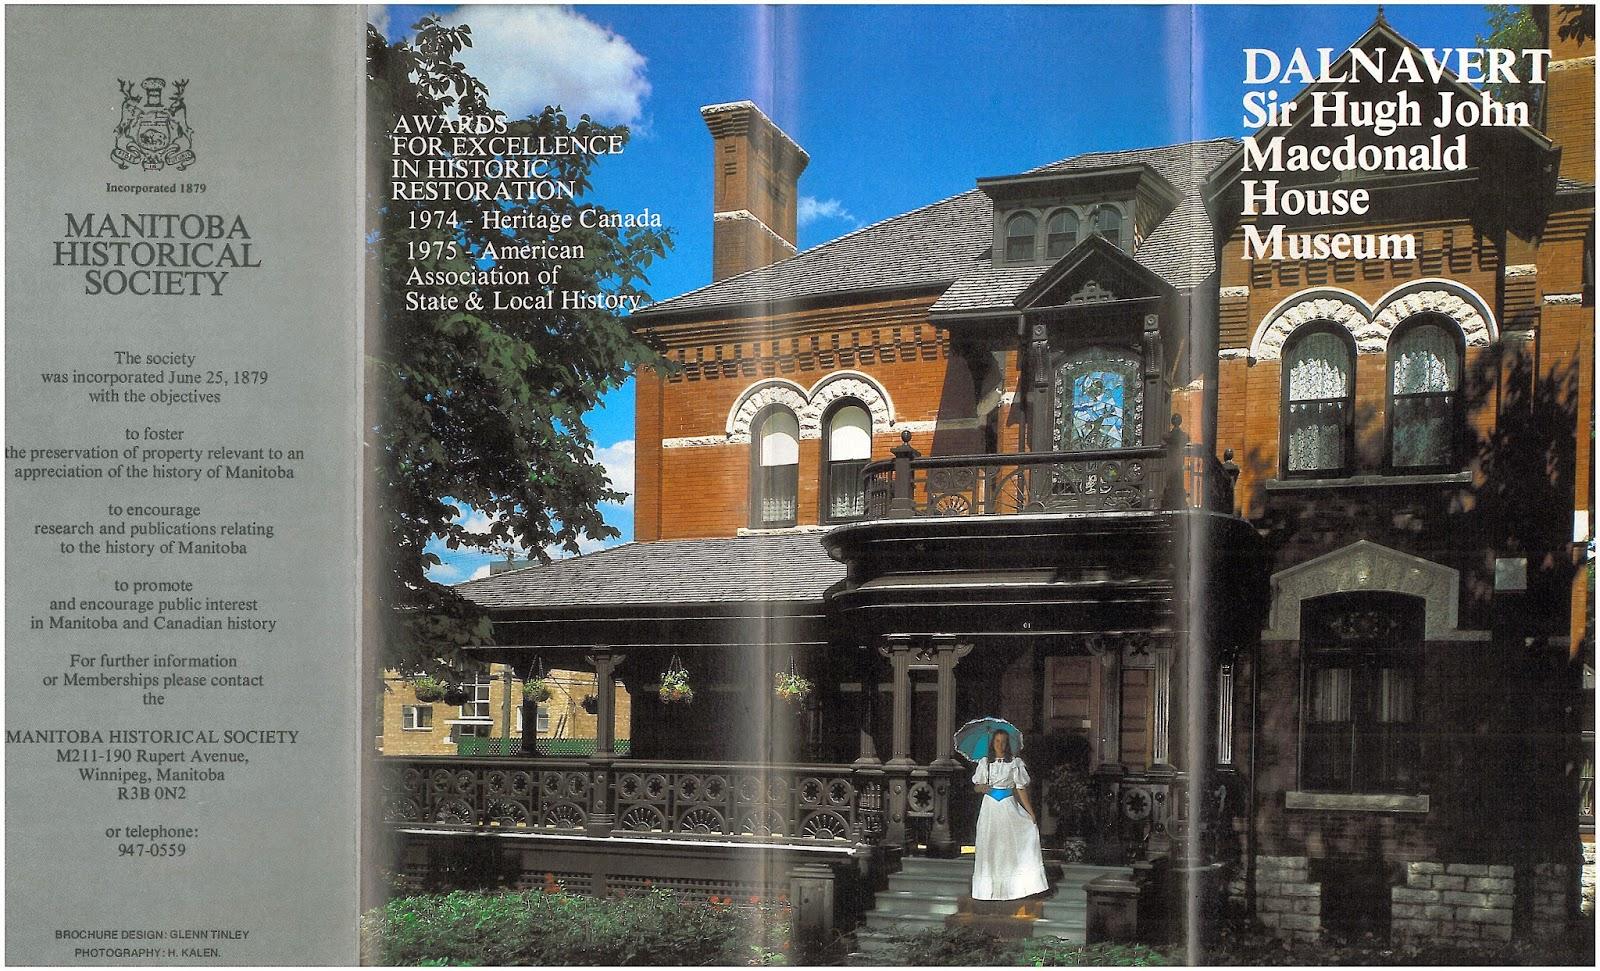 A recent Dalnavert brochure